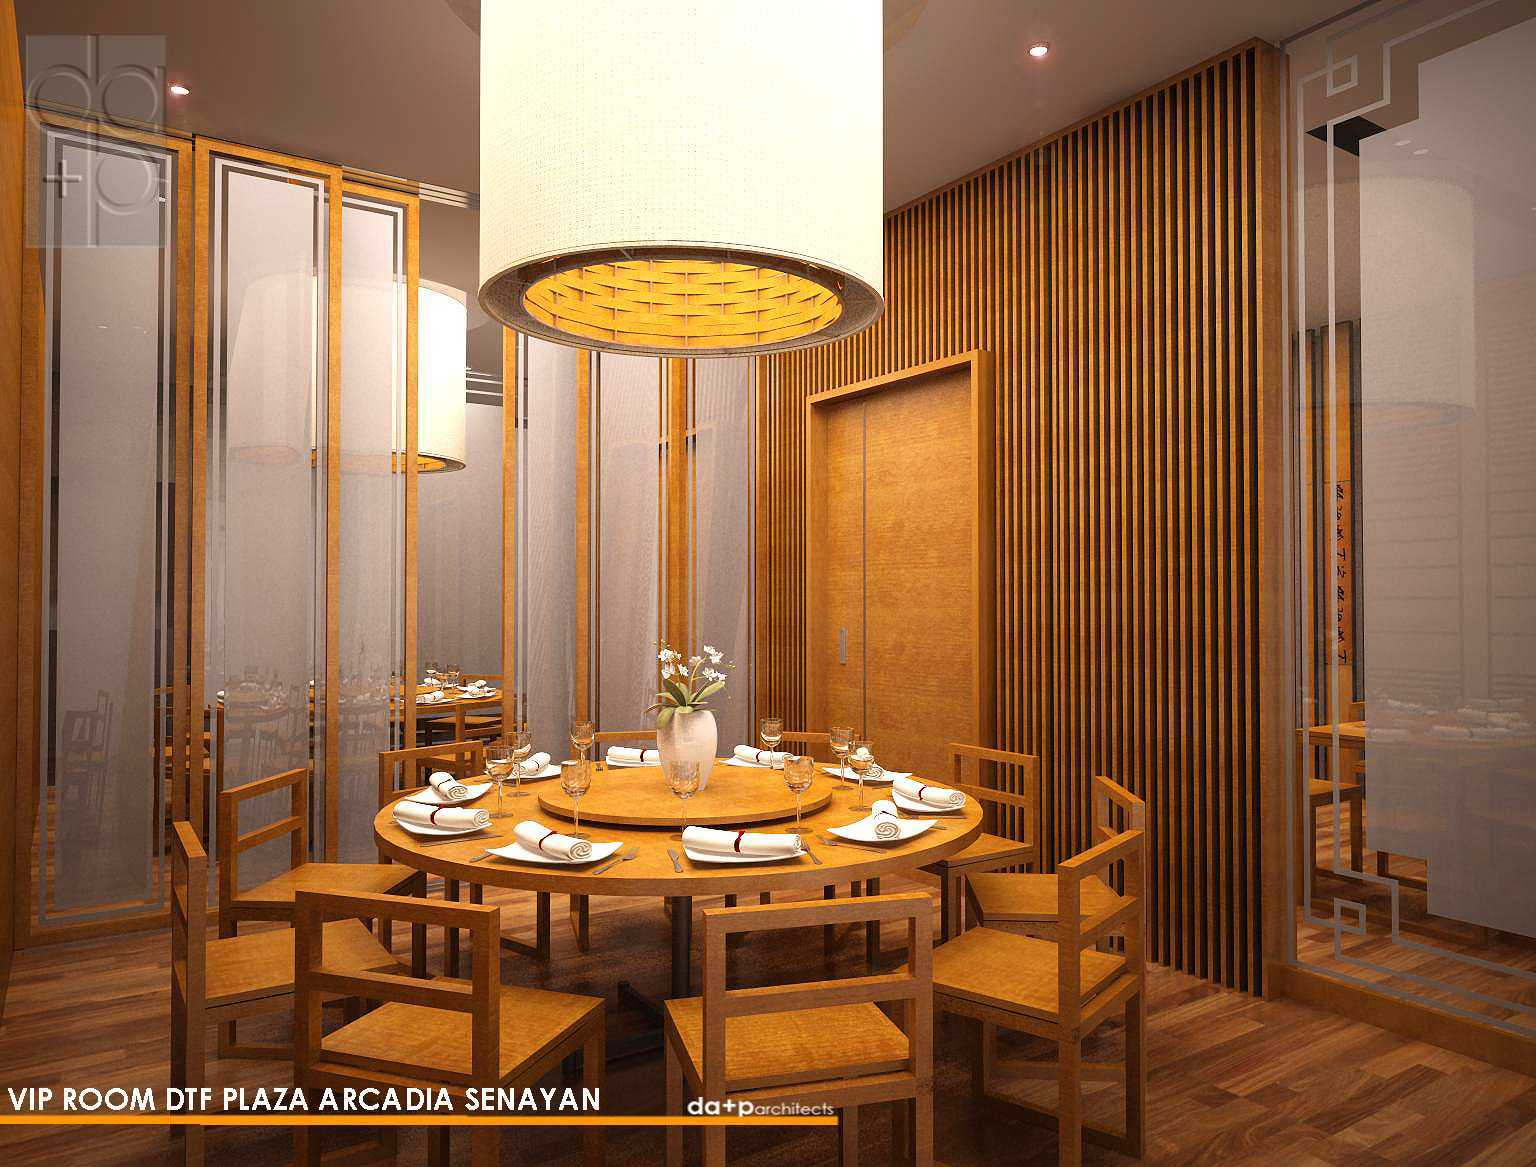 Rully Tanuwidjaja Interior Din Tai Fung Restaurant (Senayan) Plaza Arcadia Senayan, Jl. New Dhelhi, Gelora, Tanahabang, Central Jakarta City, Jakarta 10270, Indonesia  Vip Seating Area Restaurant Kontemporer  48180